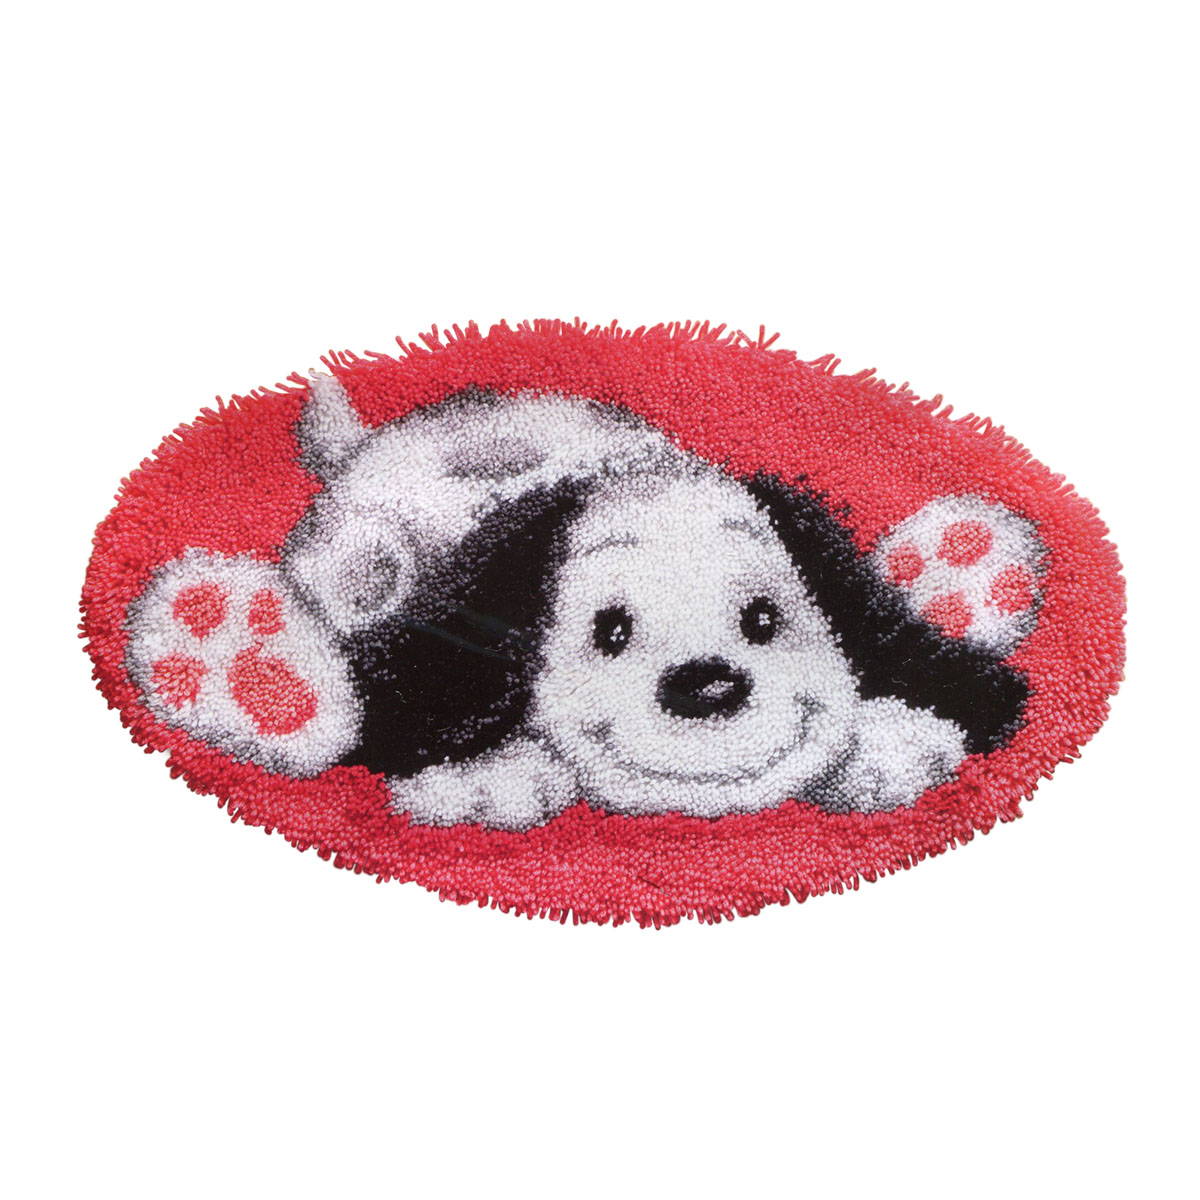 0143941-PN Коврик (ковровая техника) Vervaco 'Игривая собака' 70x40 см